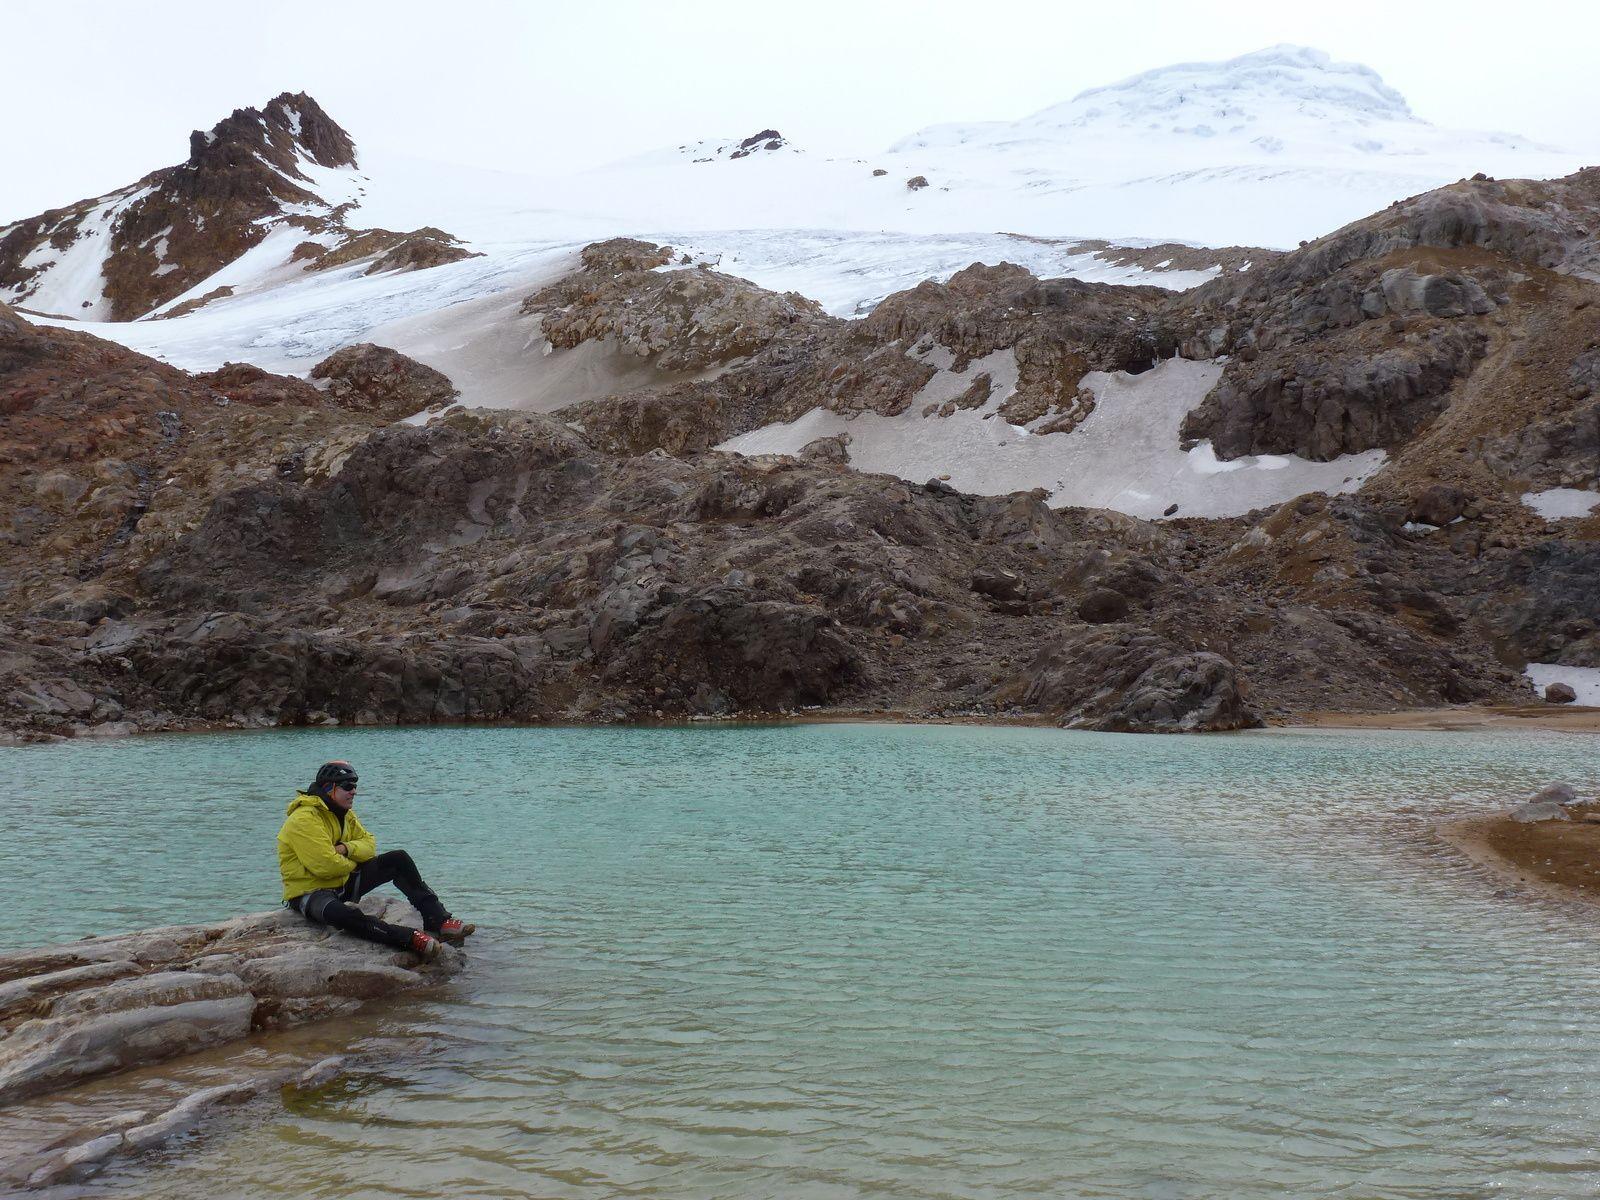 Alpinisme : Epaule du Volcan Cayambe - 5400 m